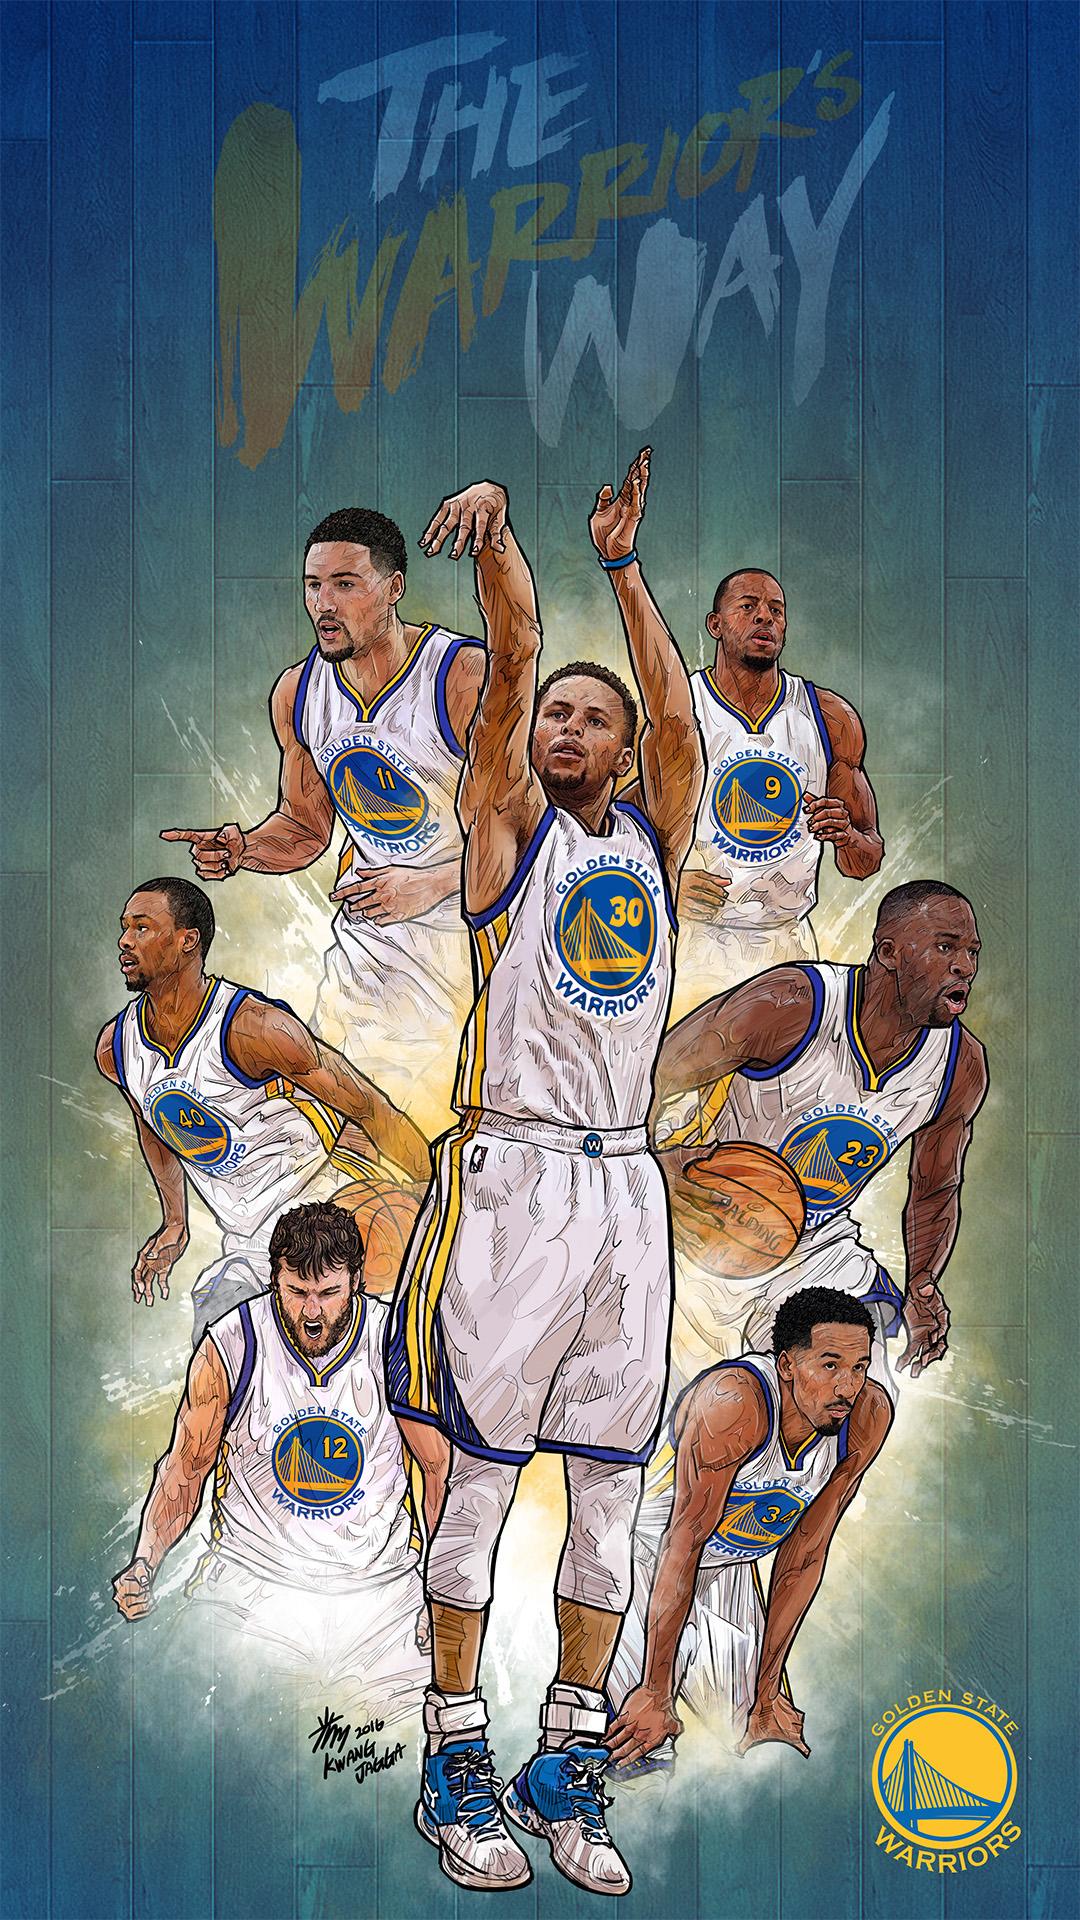 NBA-Phone-Artist-Kim-MinSuk-Yellowmenace-basketballart-GSW%E2%80%A6-wallpaper-wpc5807570